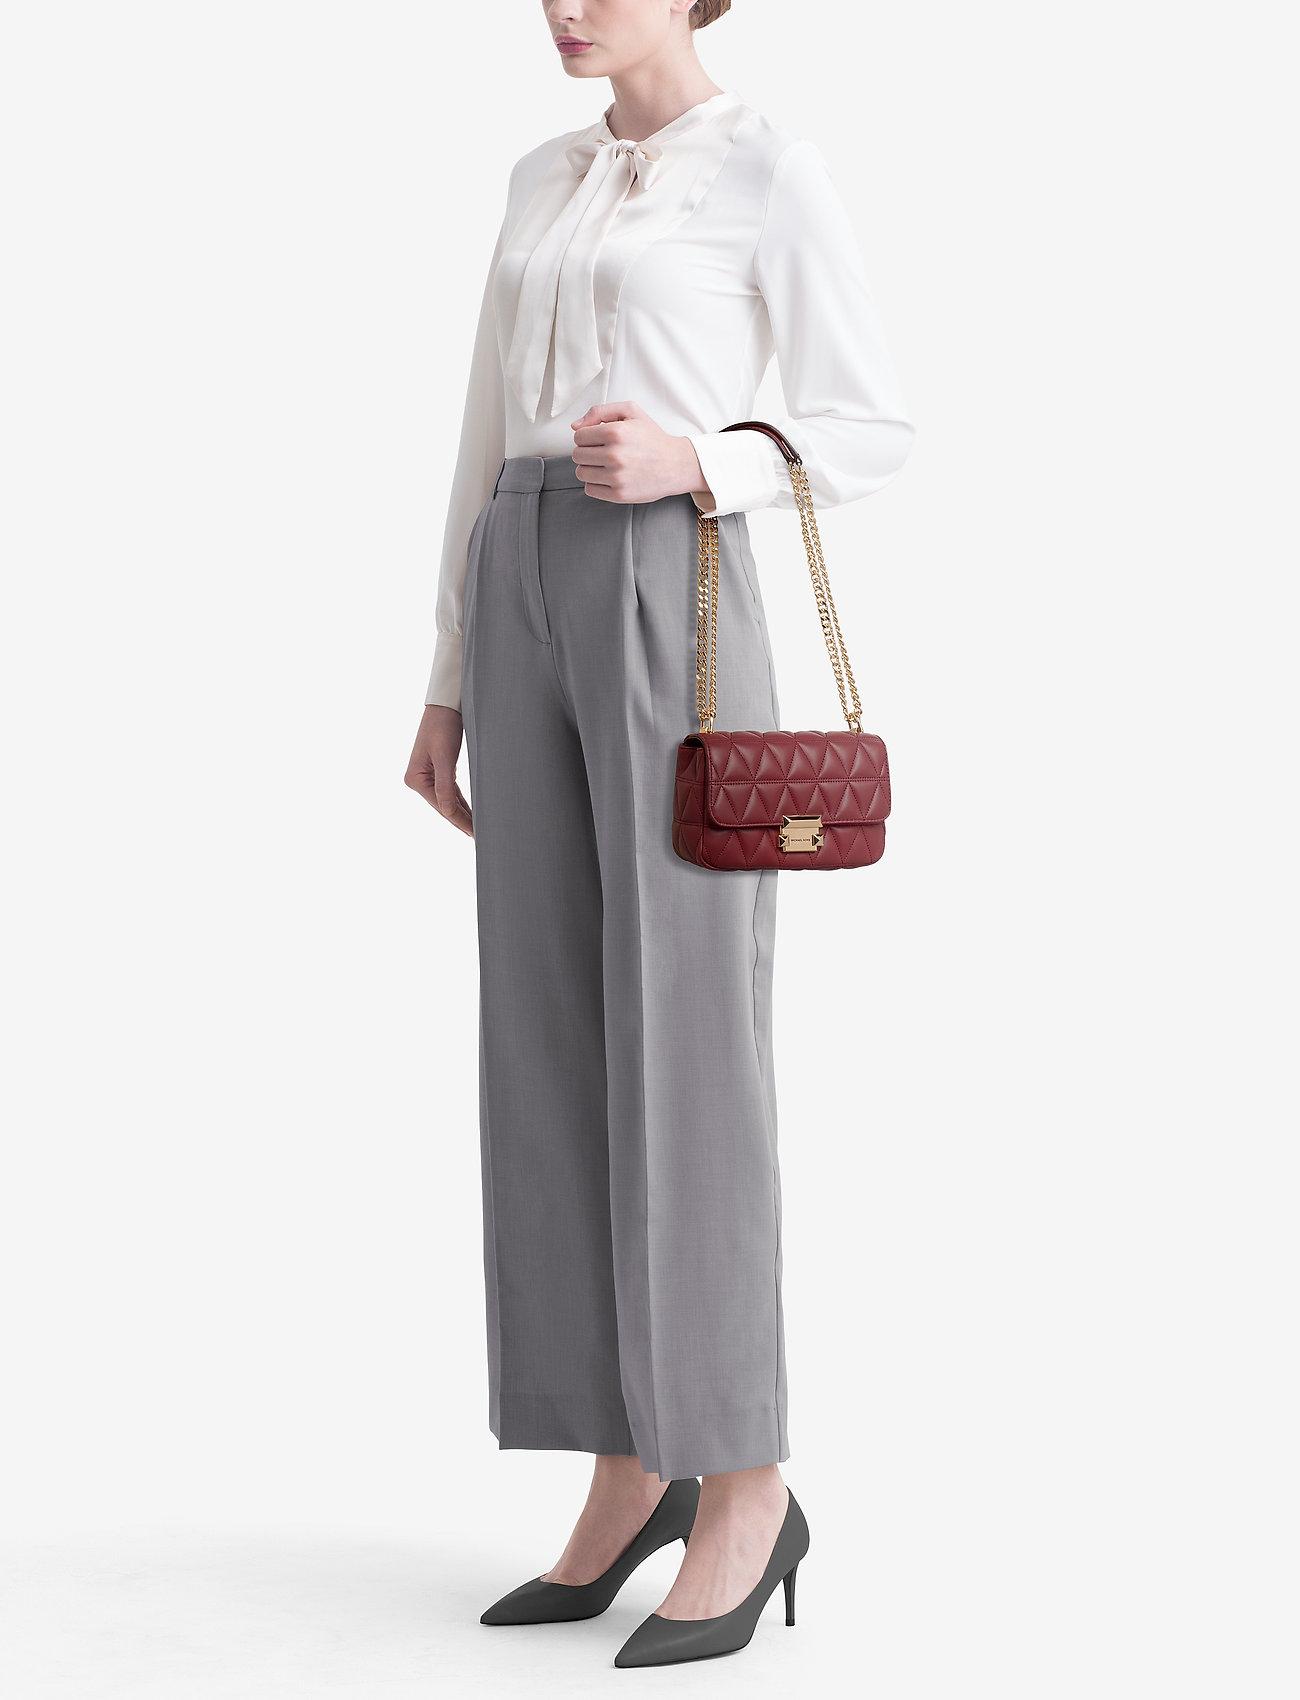 Michael Kors Bags SM CHAIN SHLDR - BRANDY